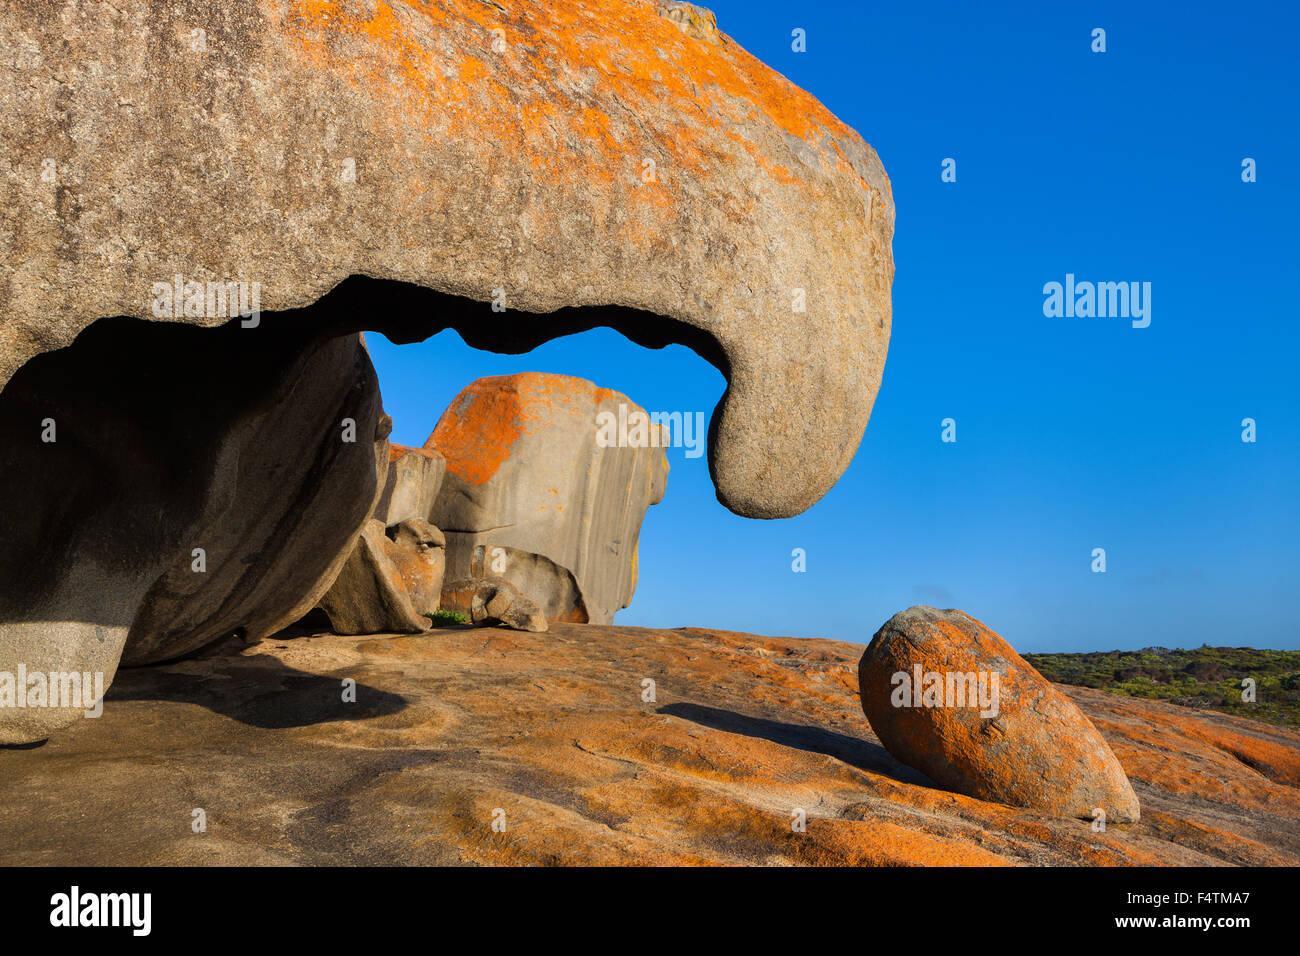 Remarkable rock, Australia, south Australia, Kangaroo Island, Flinders Chase, national park, rock, cliff, lichens Stock Photo